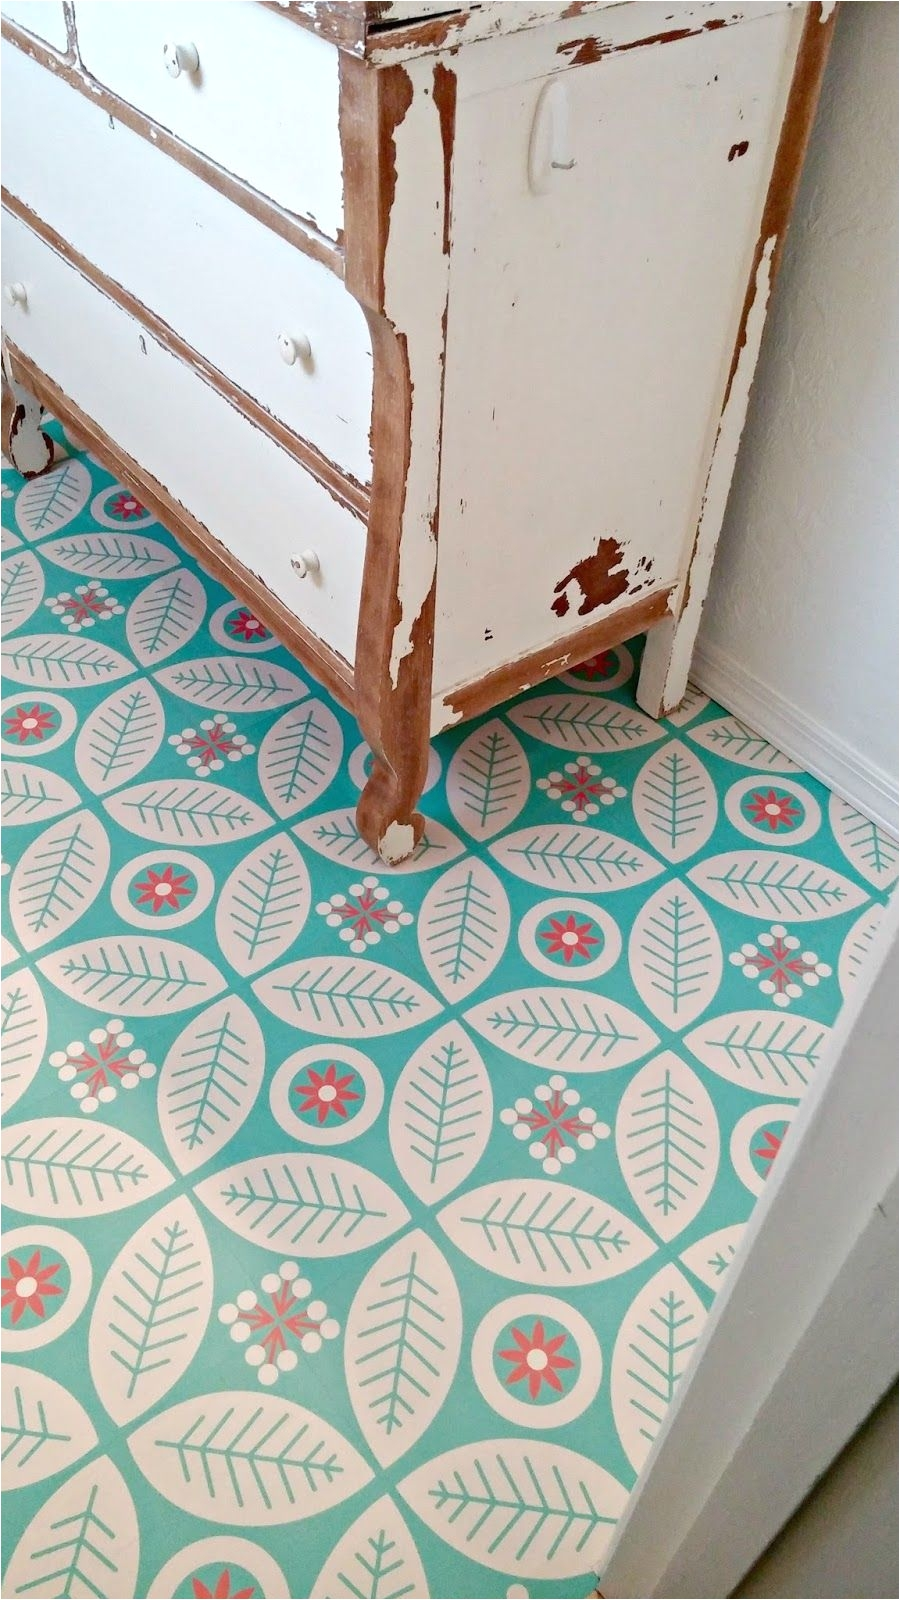 self adhesive vinyl floor tiles from mirth studios